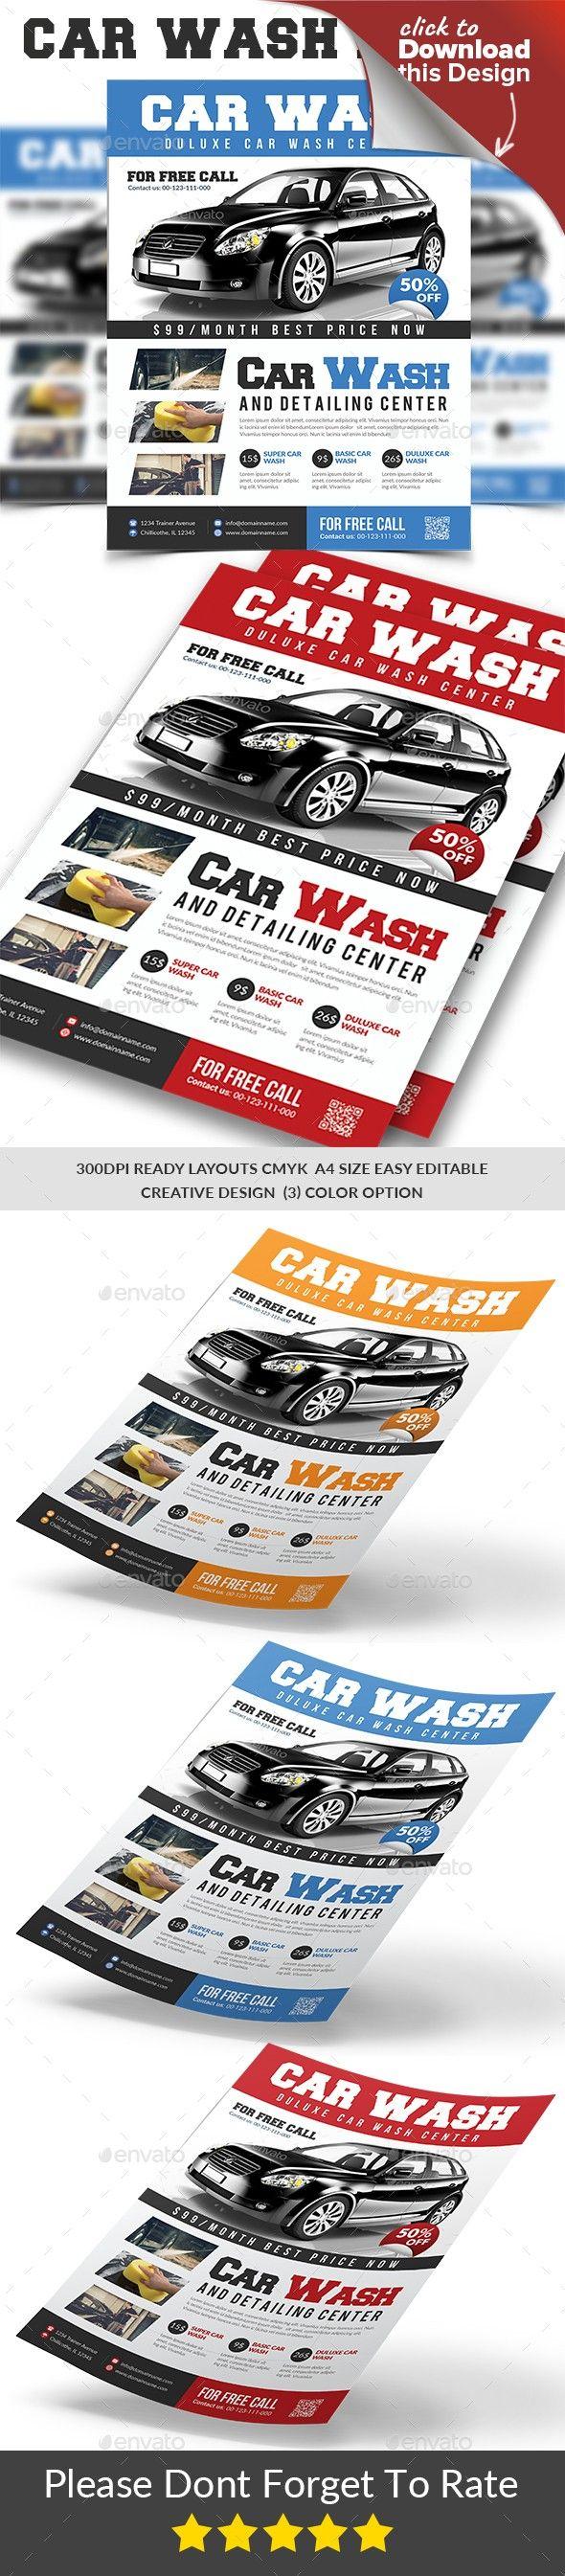 automobile, autoshow, business, car, car care, car mats, car wash, car wax, clea…